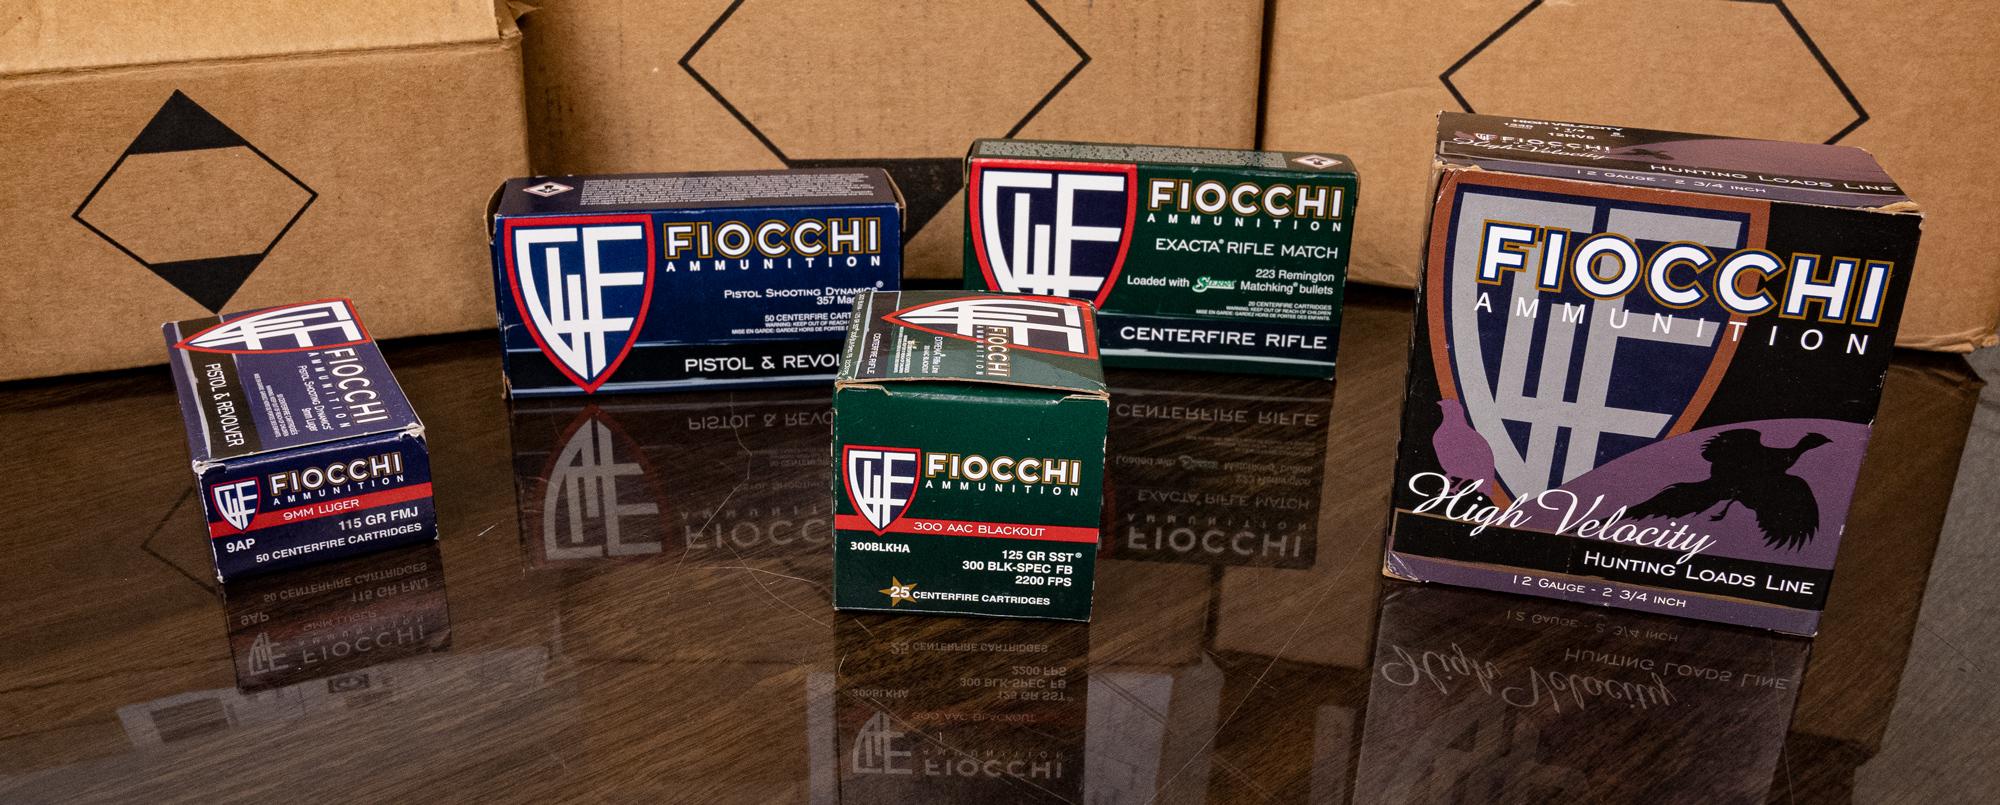 Fiocchi ammo in-stock at Ammoman.com